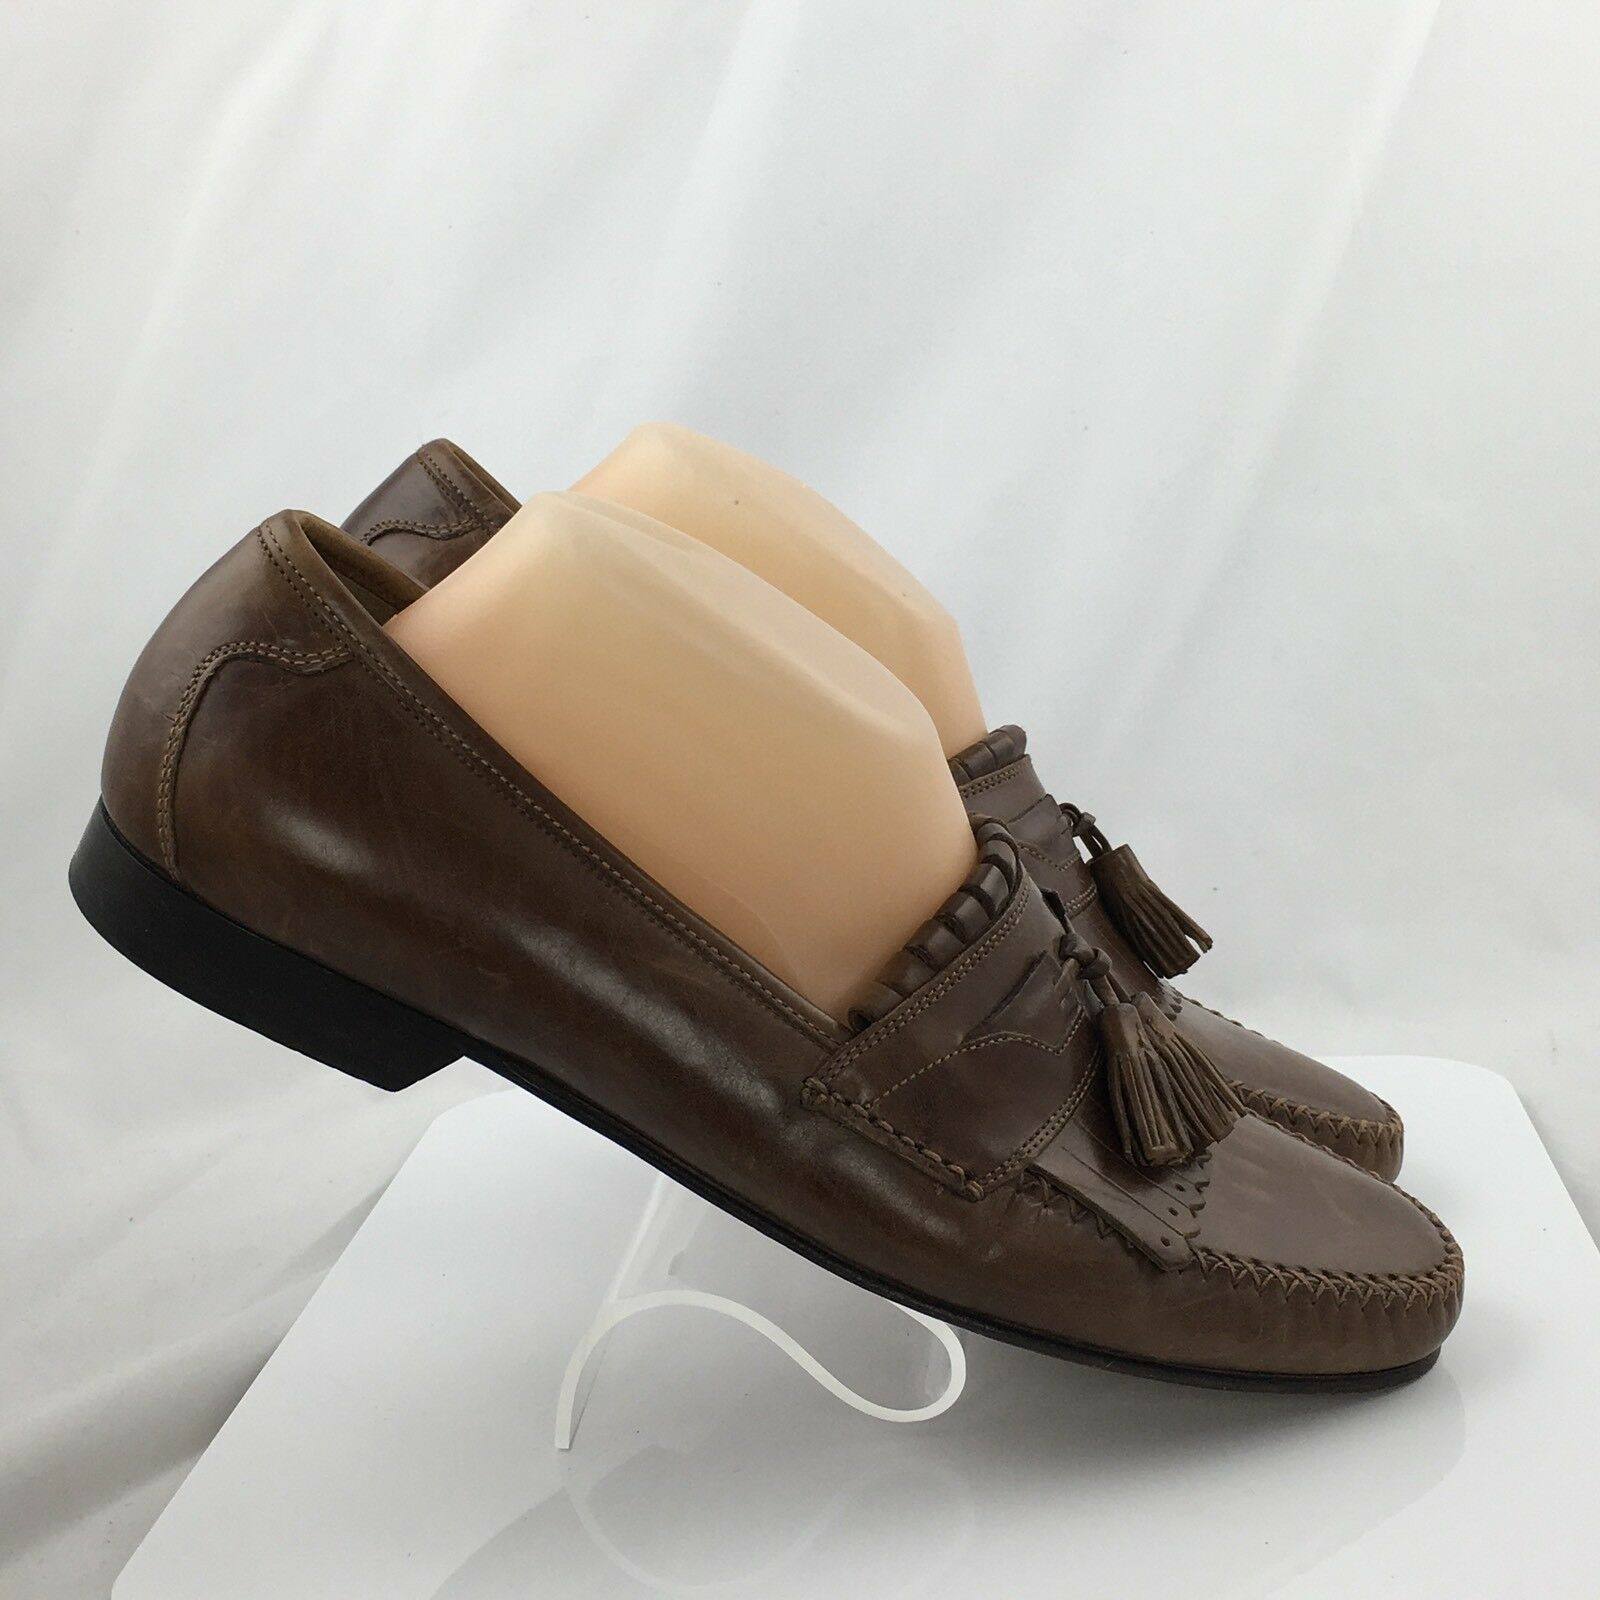 Johnston & Murphy Breland Kiltie Tassel Loafers Uomo Taglia 10M Saddle Tan 15-0836